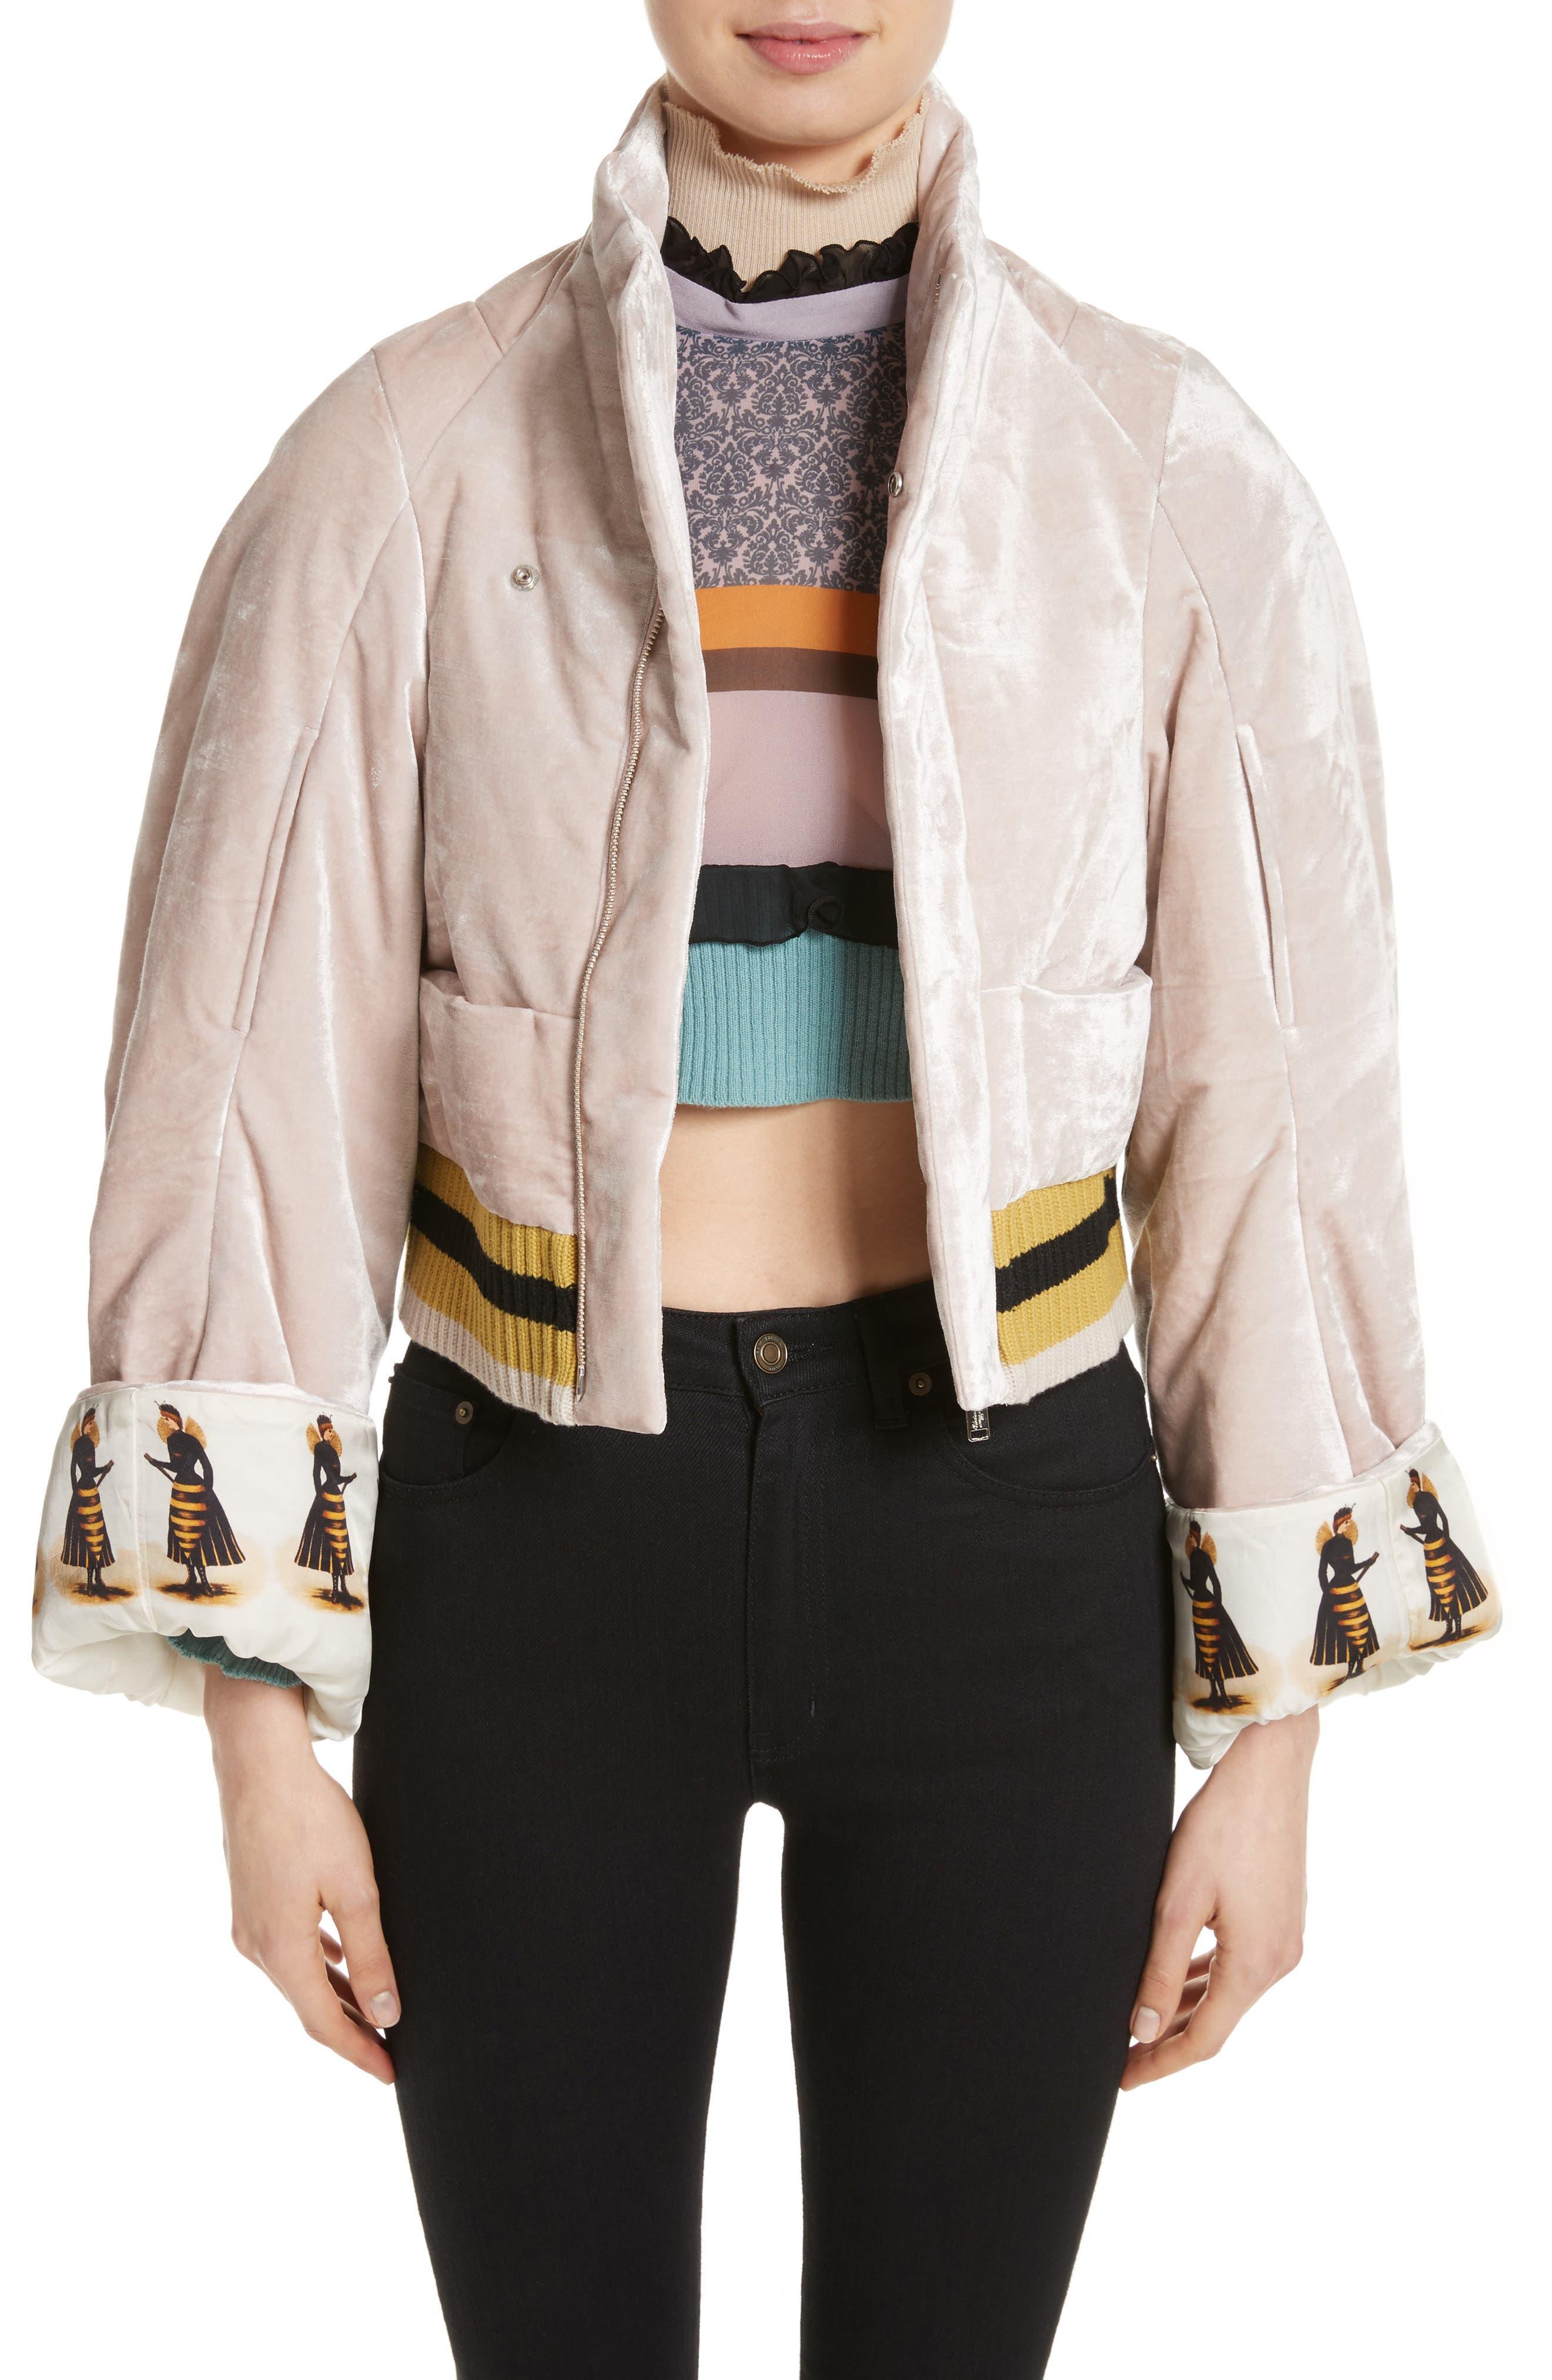 Undercover Crushed Velvet Jacket